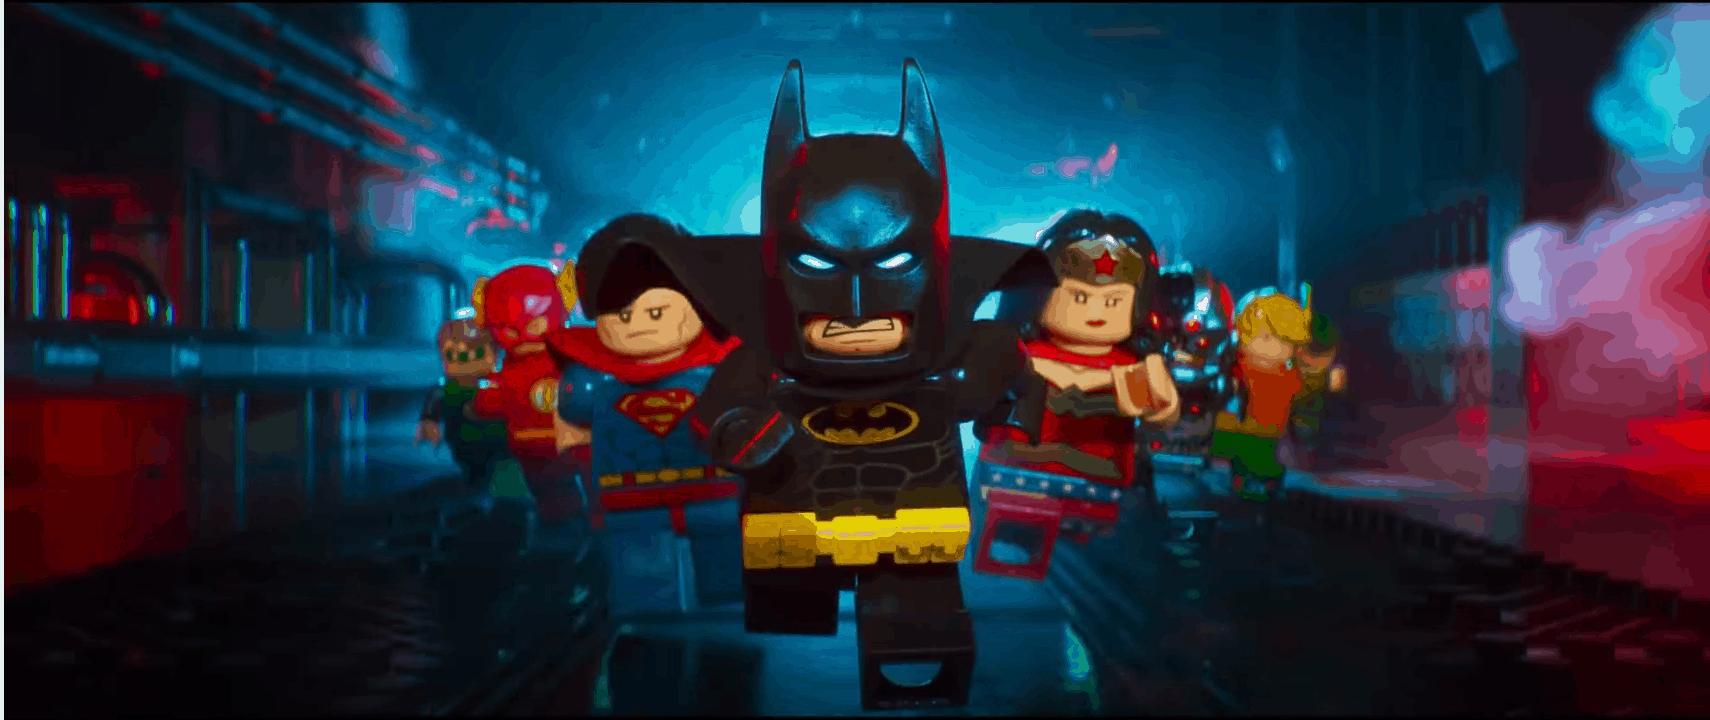 Screenshot of the Lego batman movie